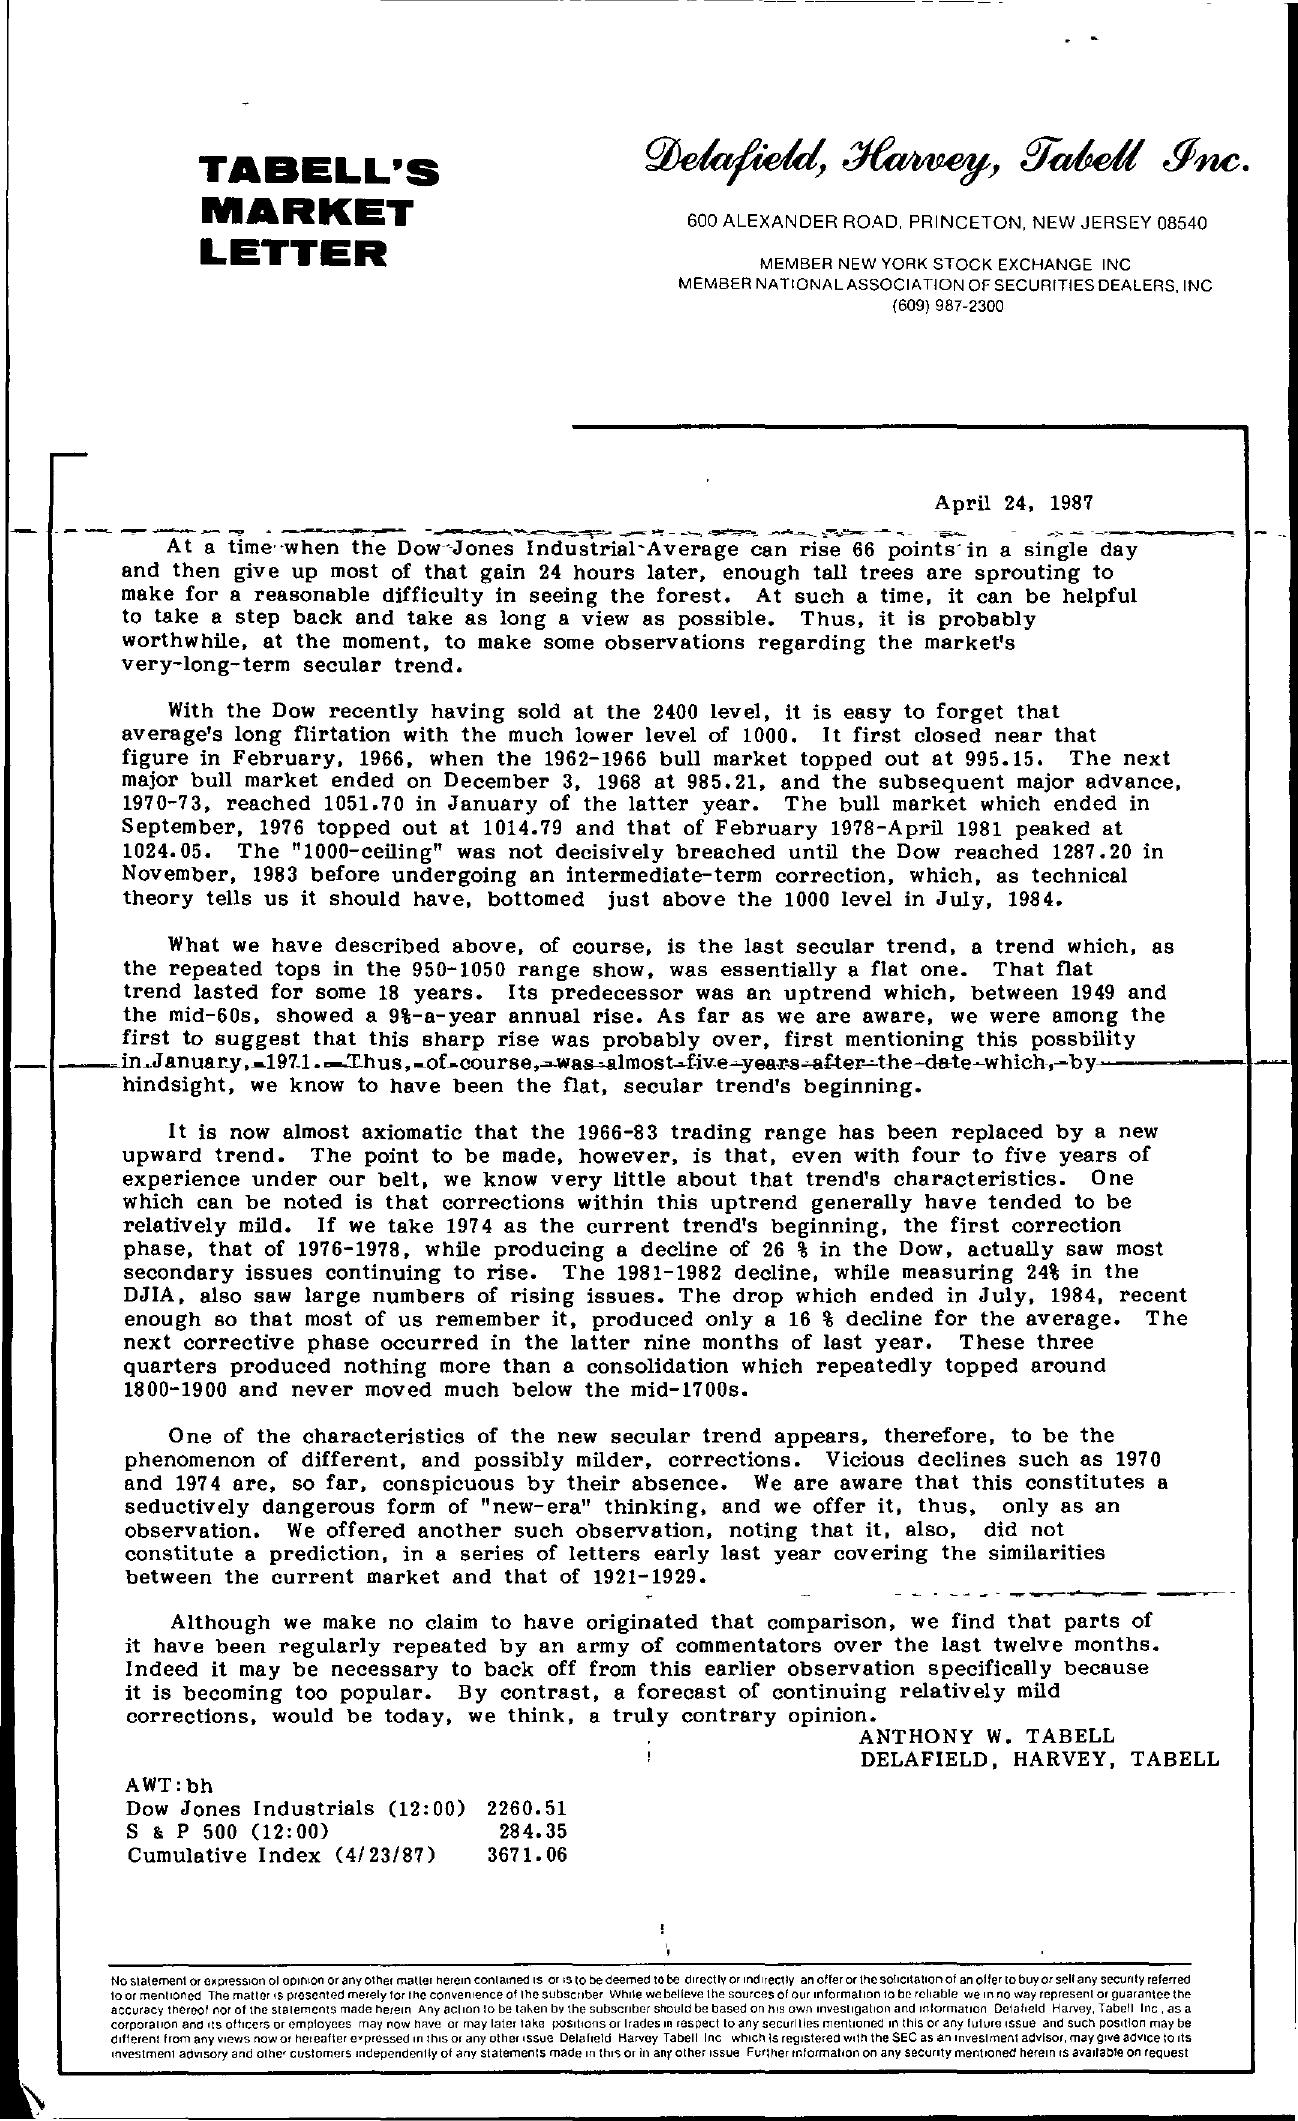 Tabell's Market Letter - April 24, 1987